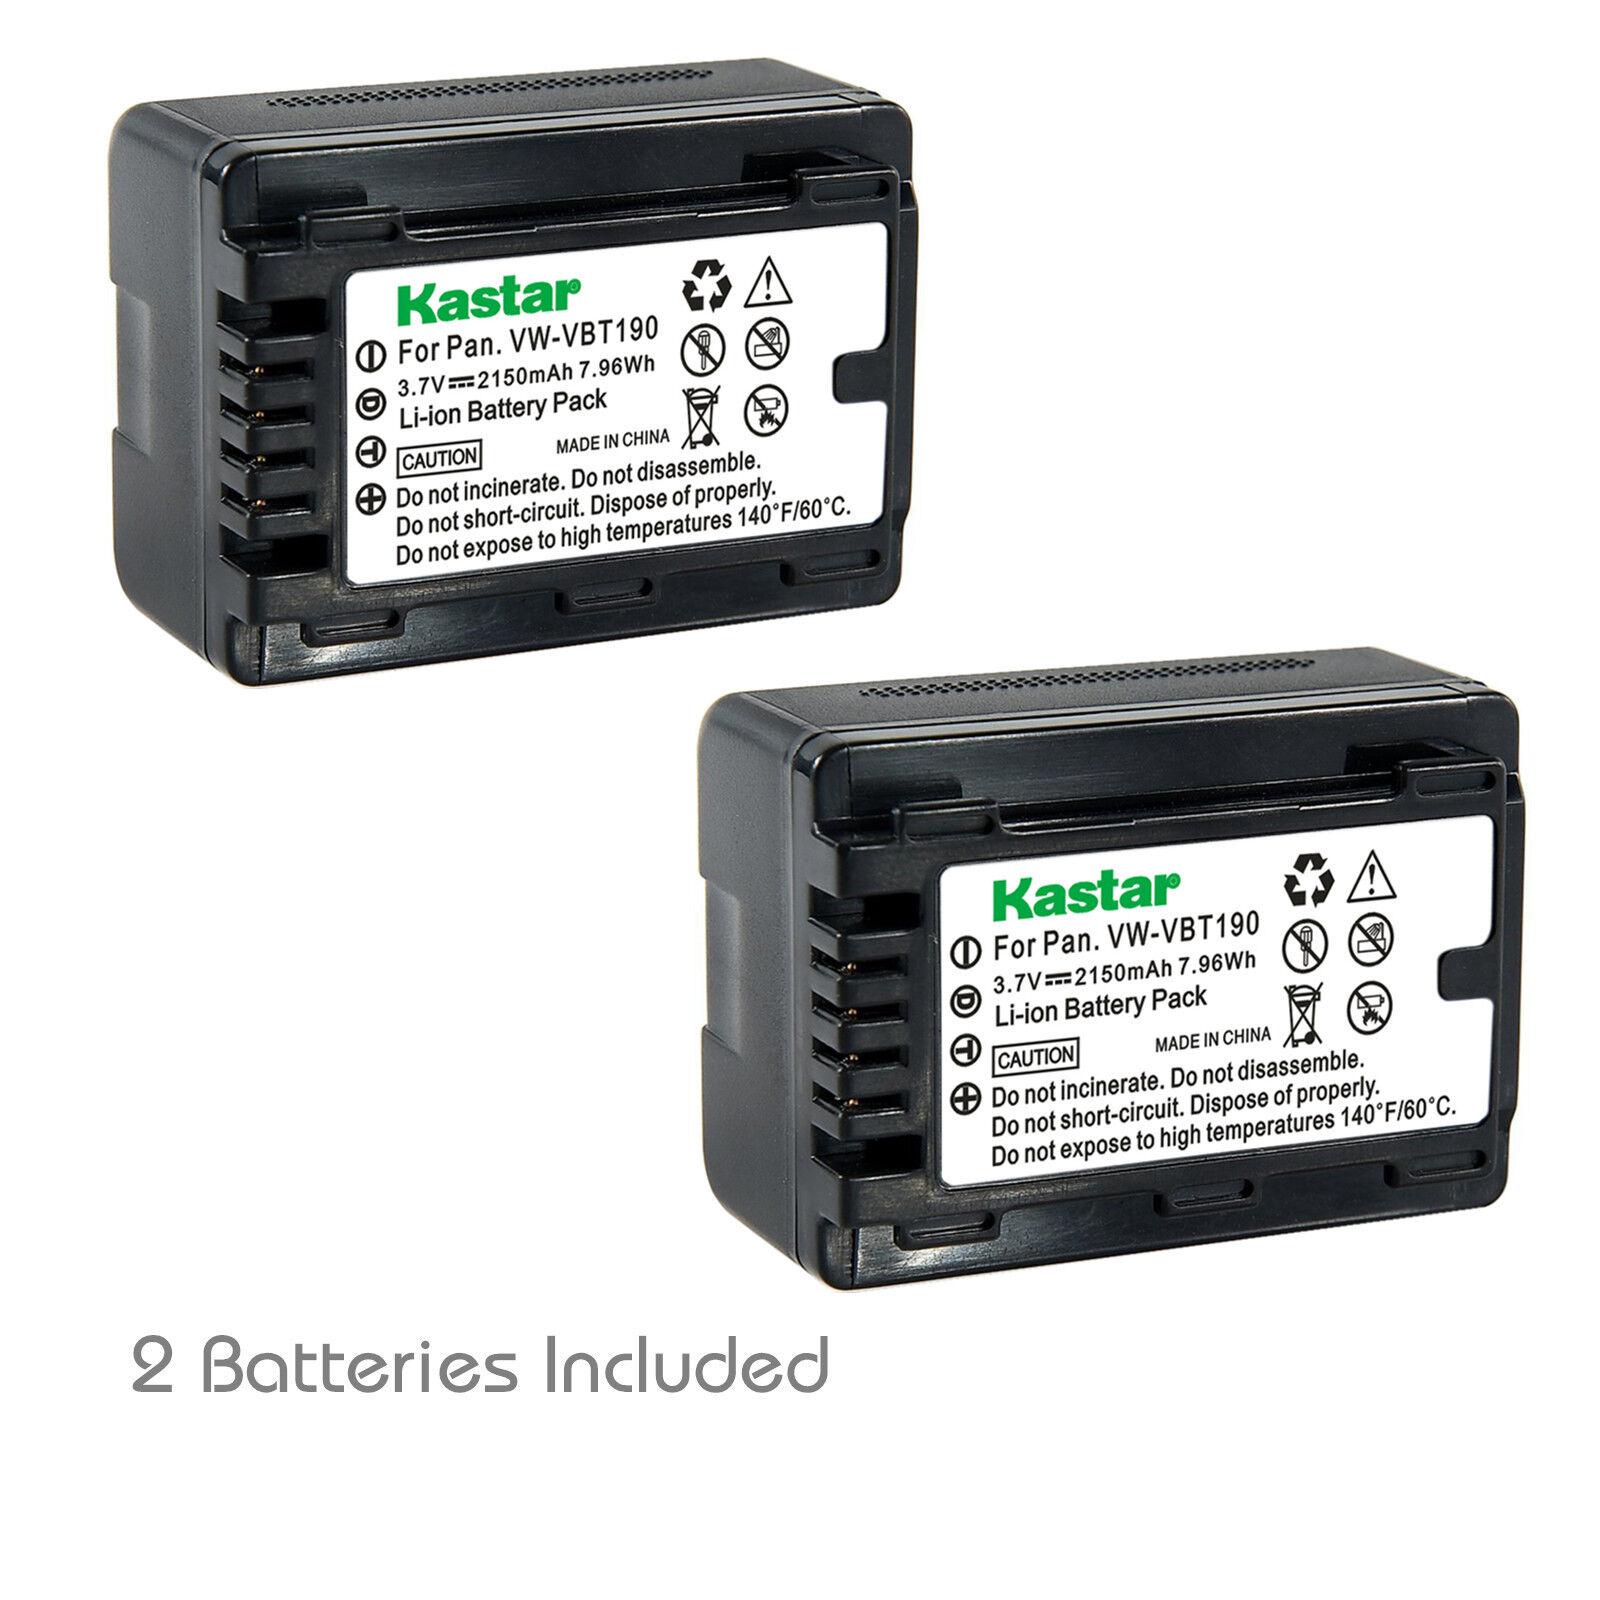 Panasonic Hc Vx870 Compare Prices At Nextag Camcorder Wx970 4k Ultra Hd 2x Kastar Battery For Vw Vbt190 V110 V130